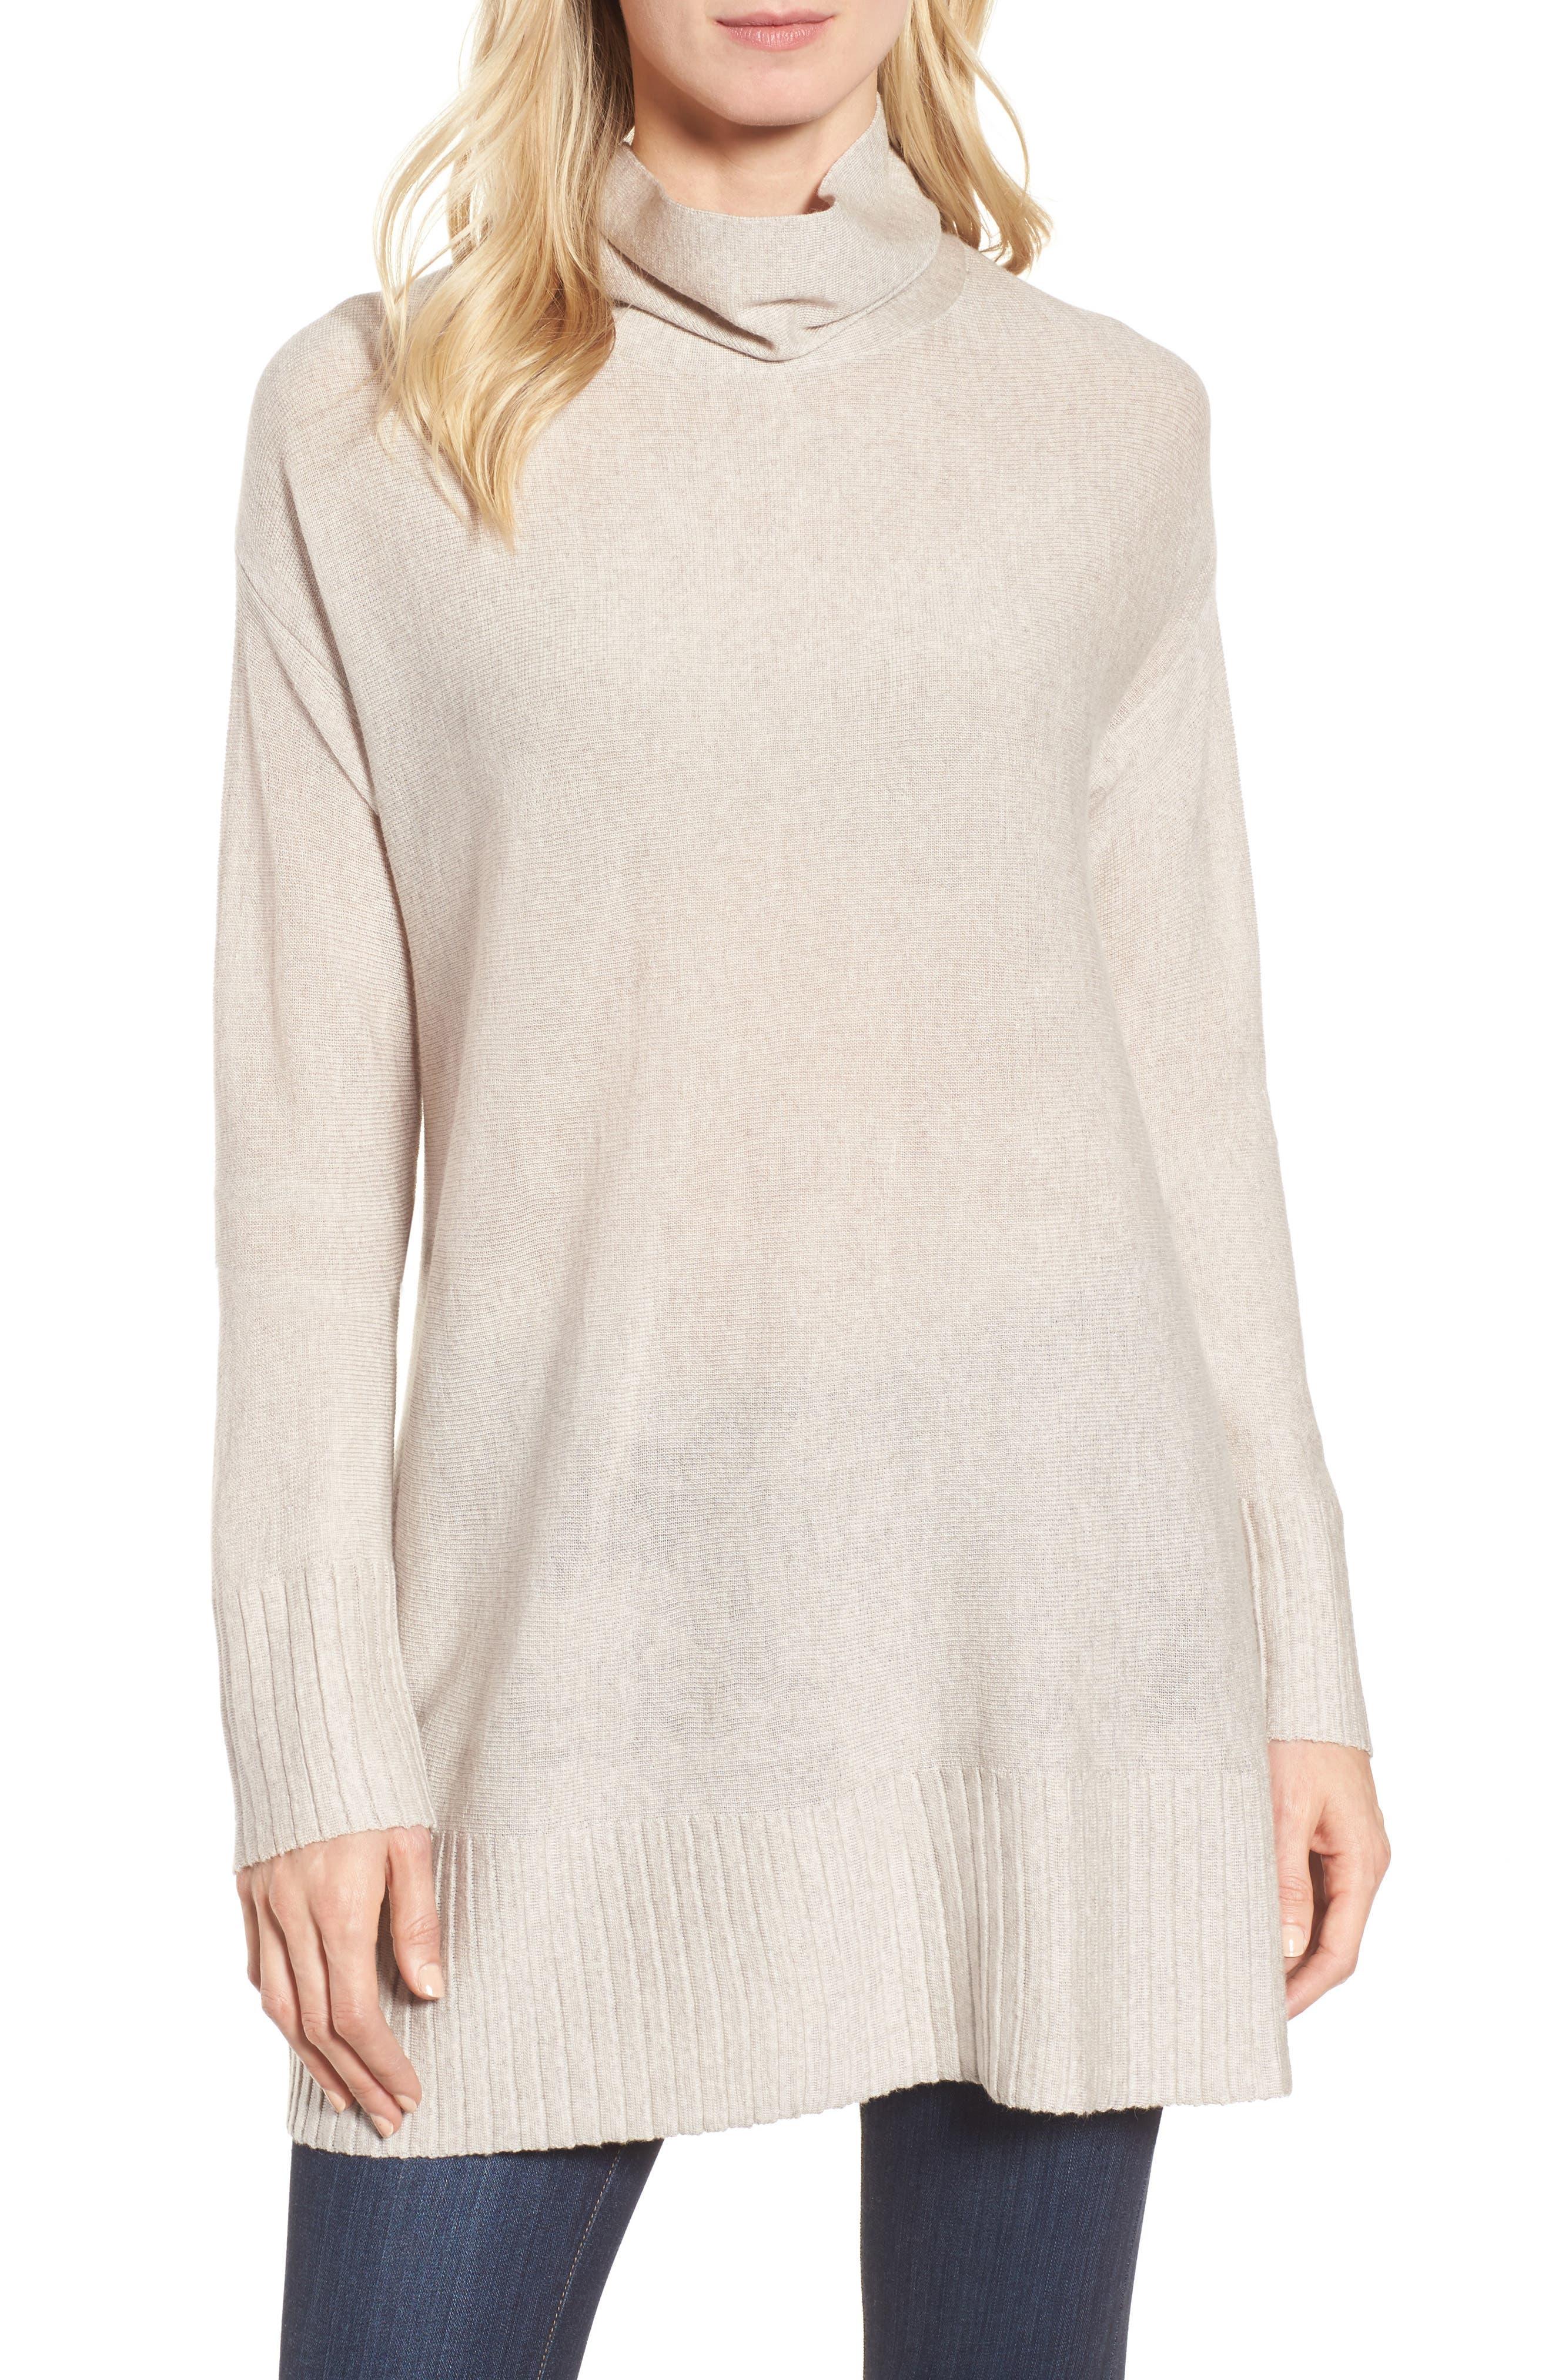 Alternate Image 1 Selected - Eileen Fisher Merino Wool Tunic Sweater